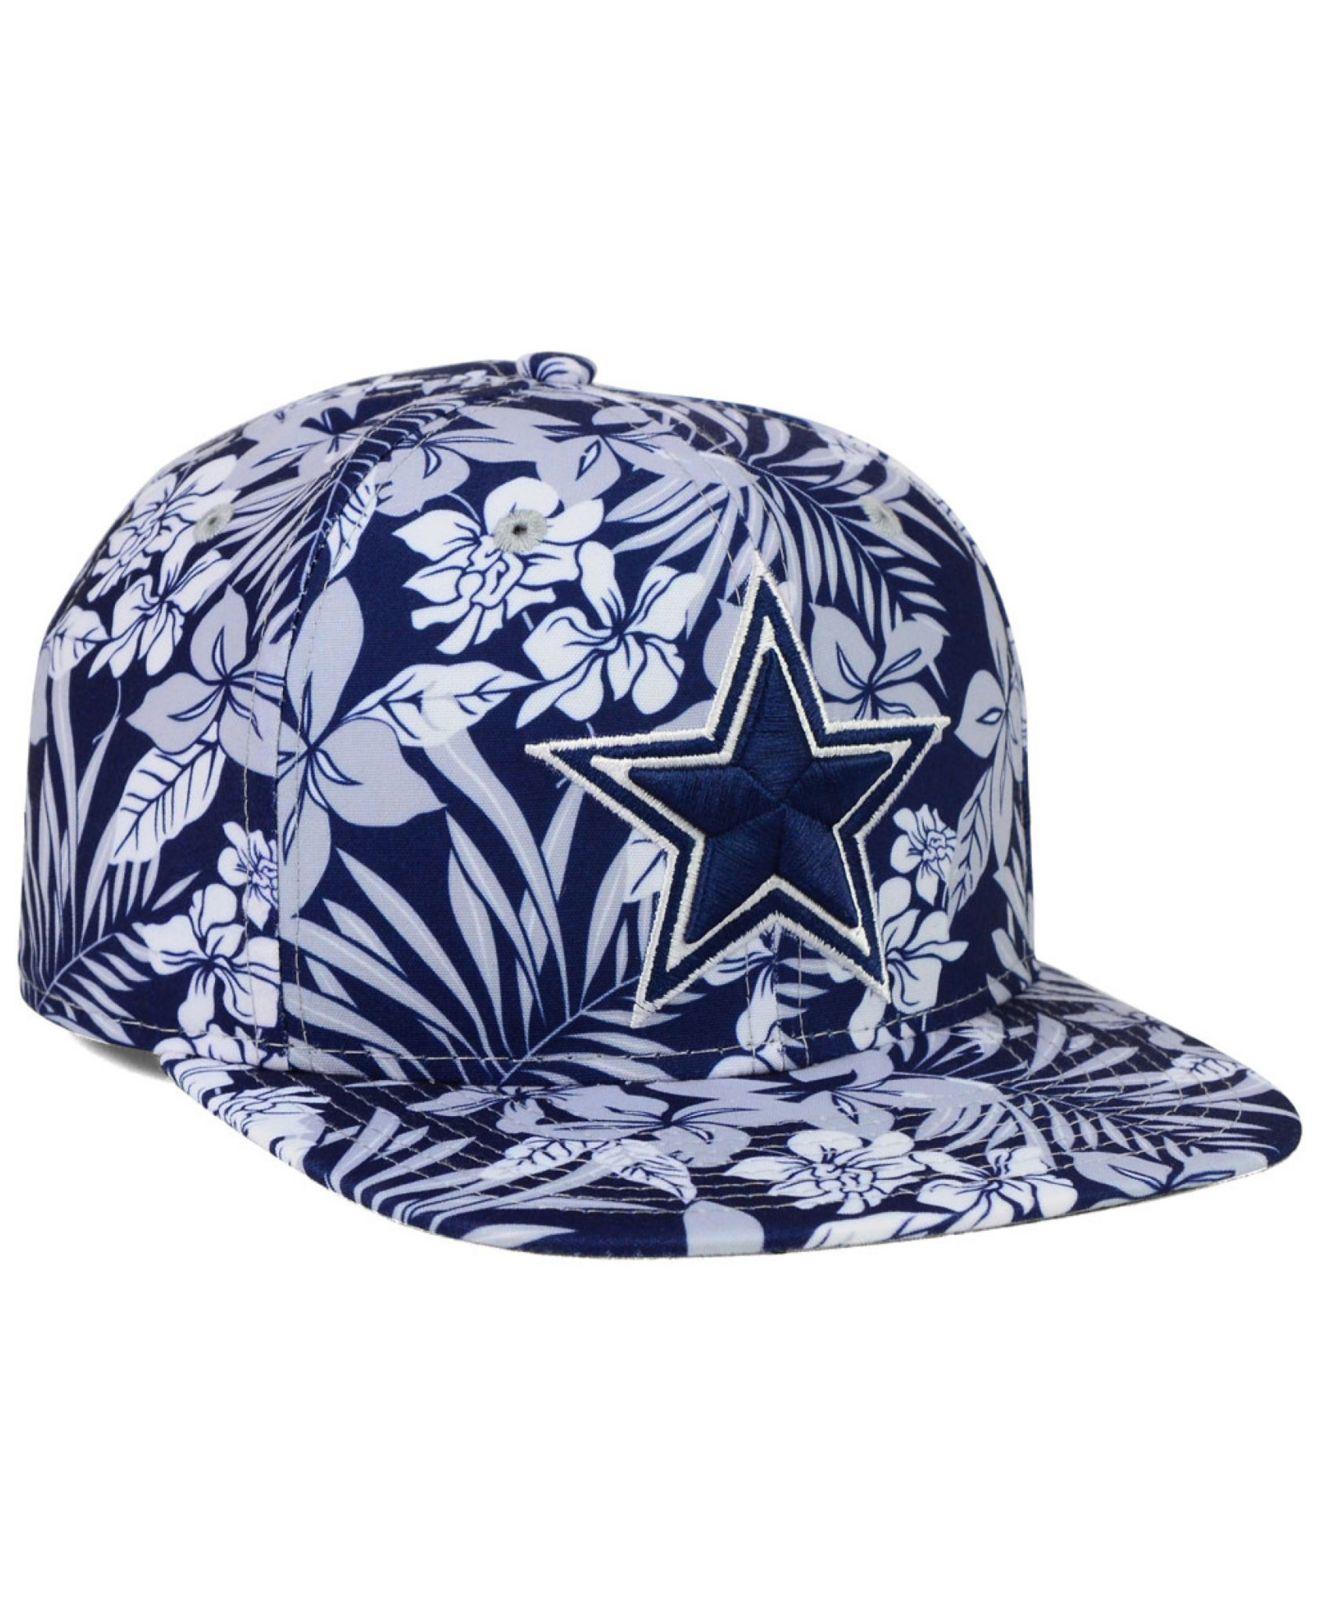 Lyst Ktz Dallas Cowboys Wowie Snapback Cap In Gray For Men